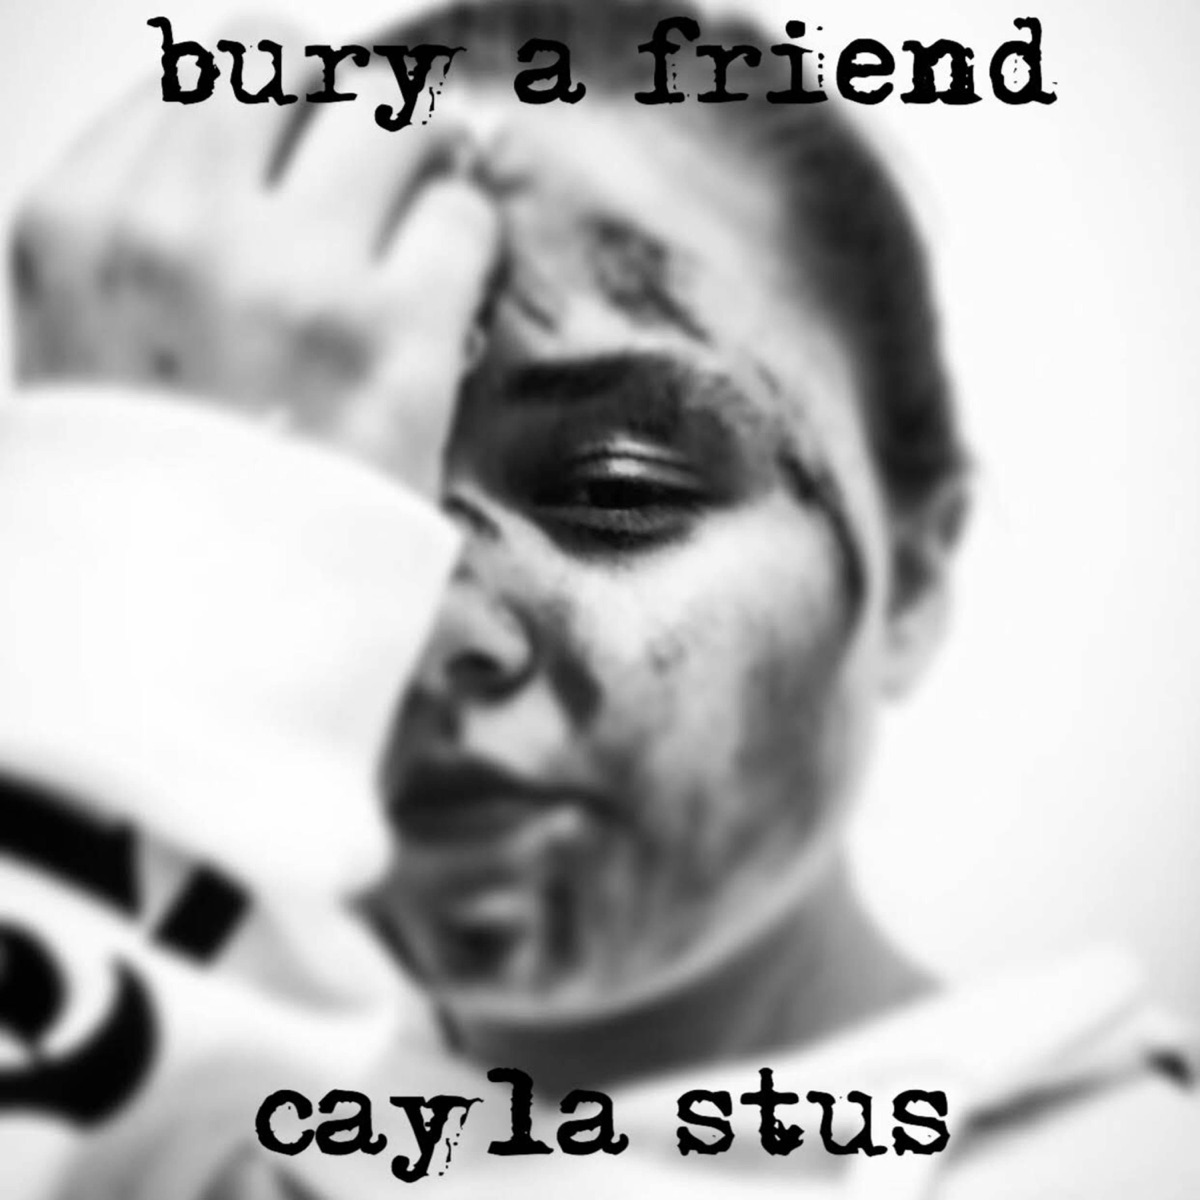 Bury a Friend - Single Cayla Stus CD cover